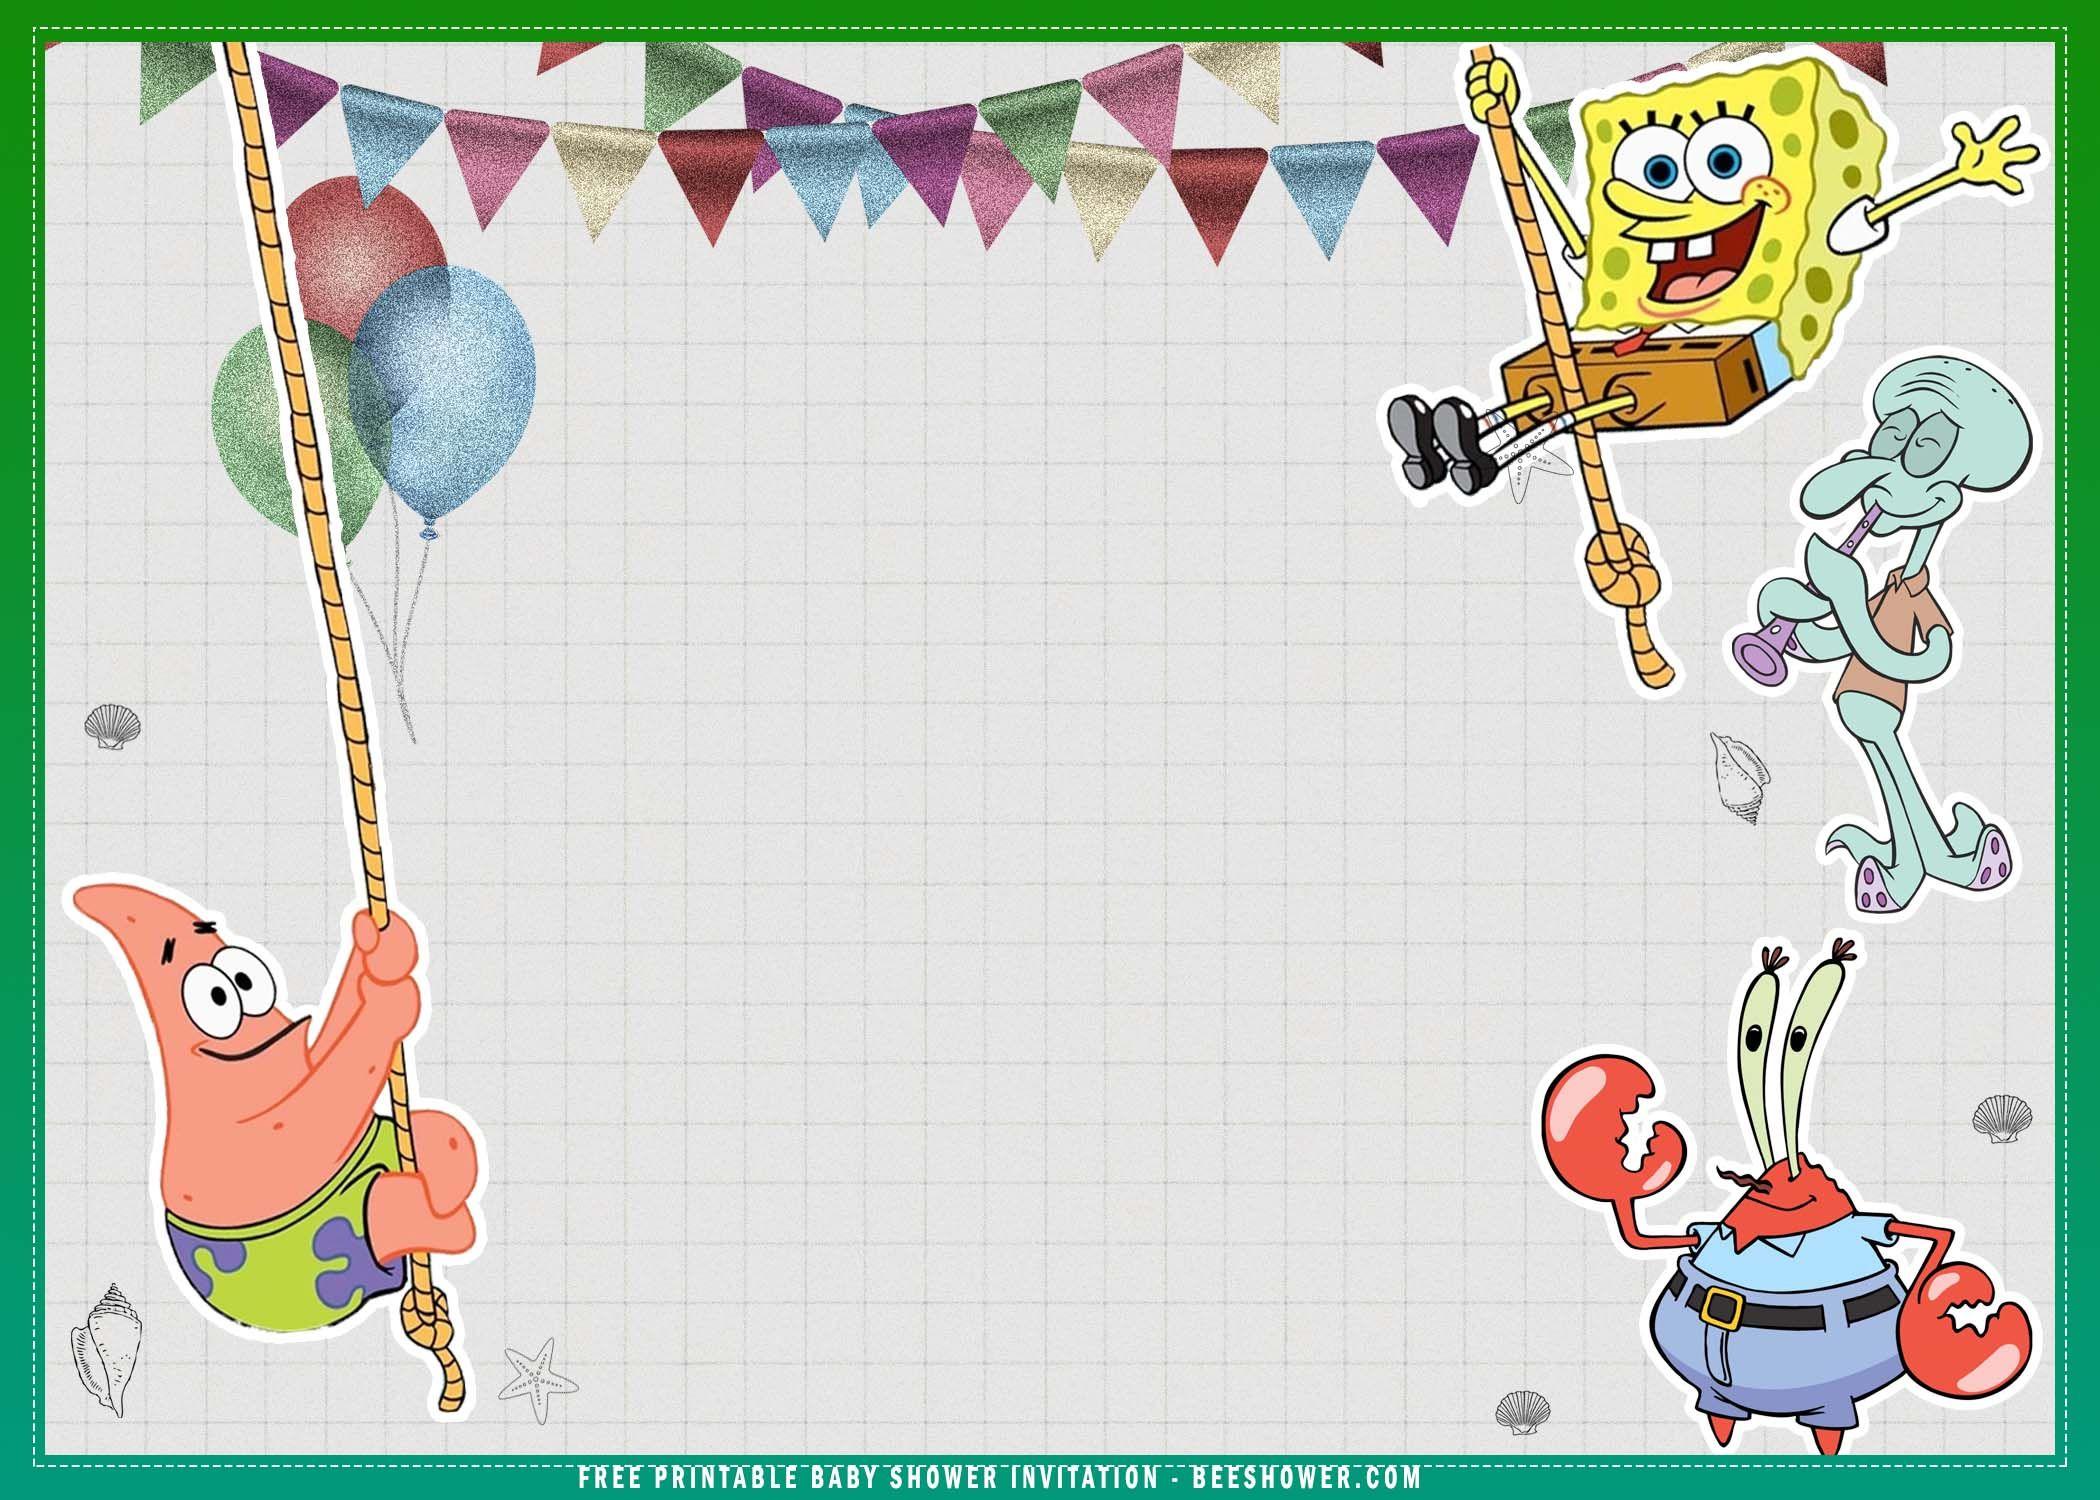 Free Printable Spongebob Squarepants Baby Shower Invitation Birthday Card Printable Free Printable Baby Shower Invitations Baby Shower Invitation Templates